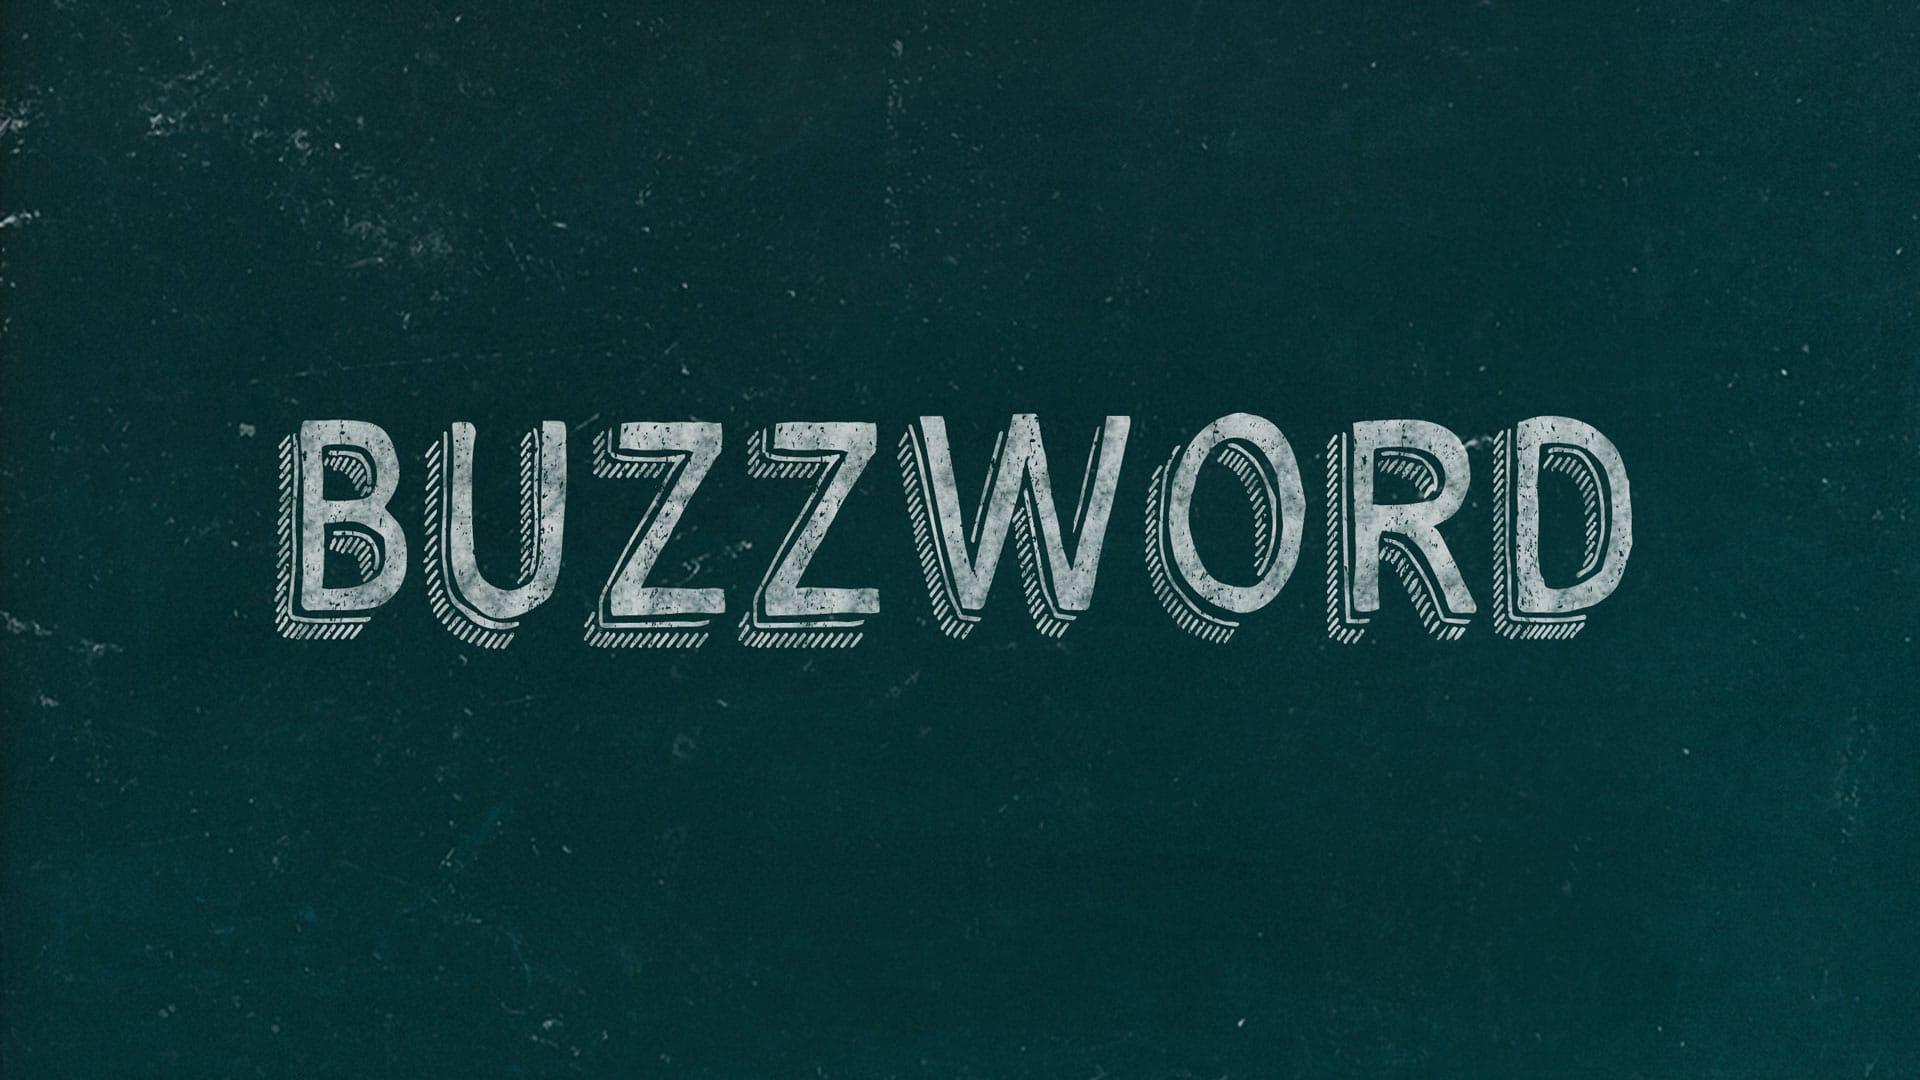 Buzzword Green Image